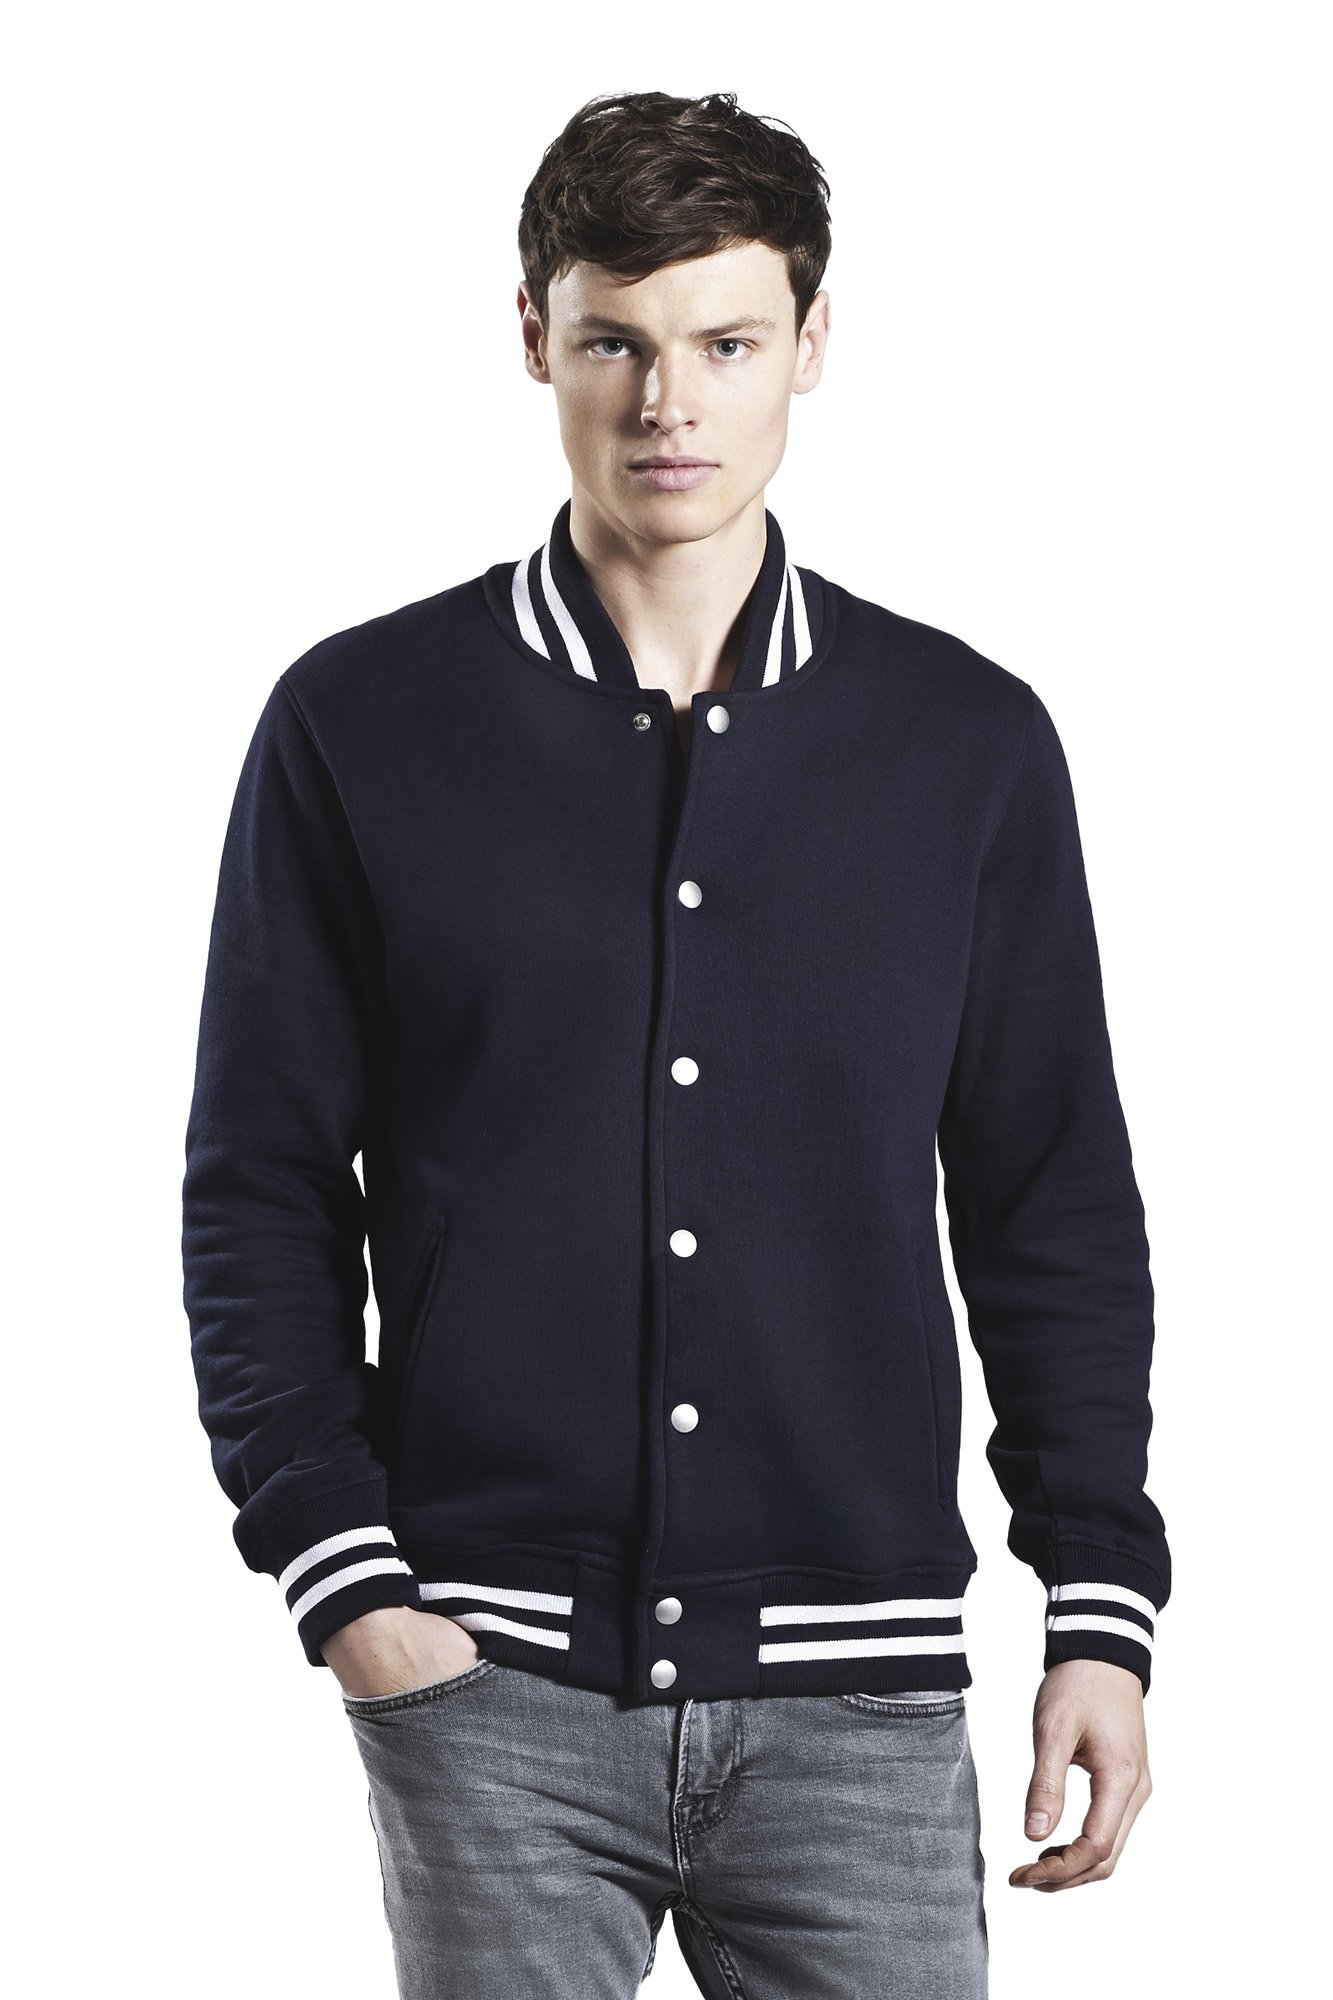 Black Varsity Jacket for Men   100% Organic Cotton Lightweight Unisex   Large by Underhood of London